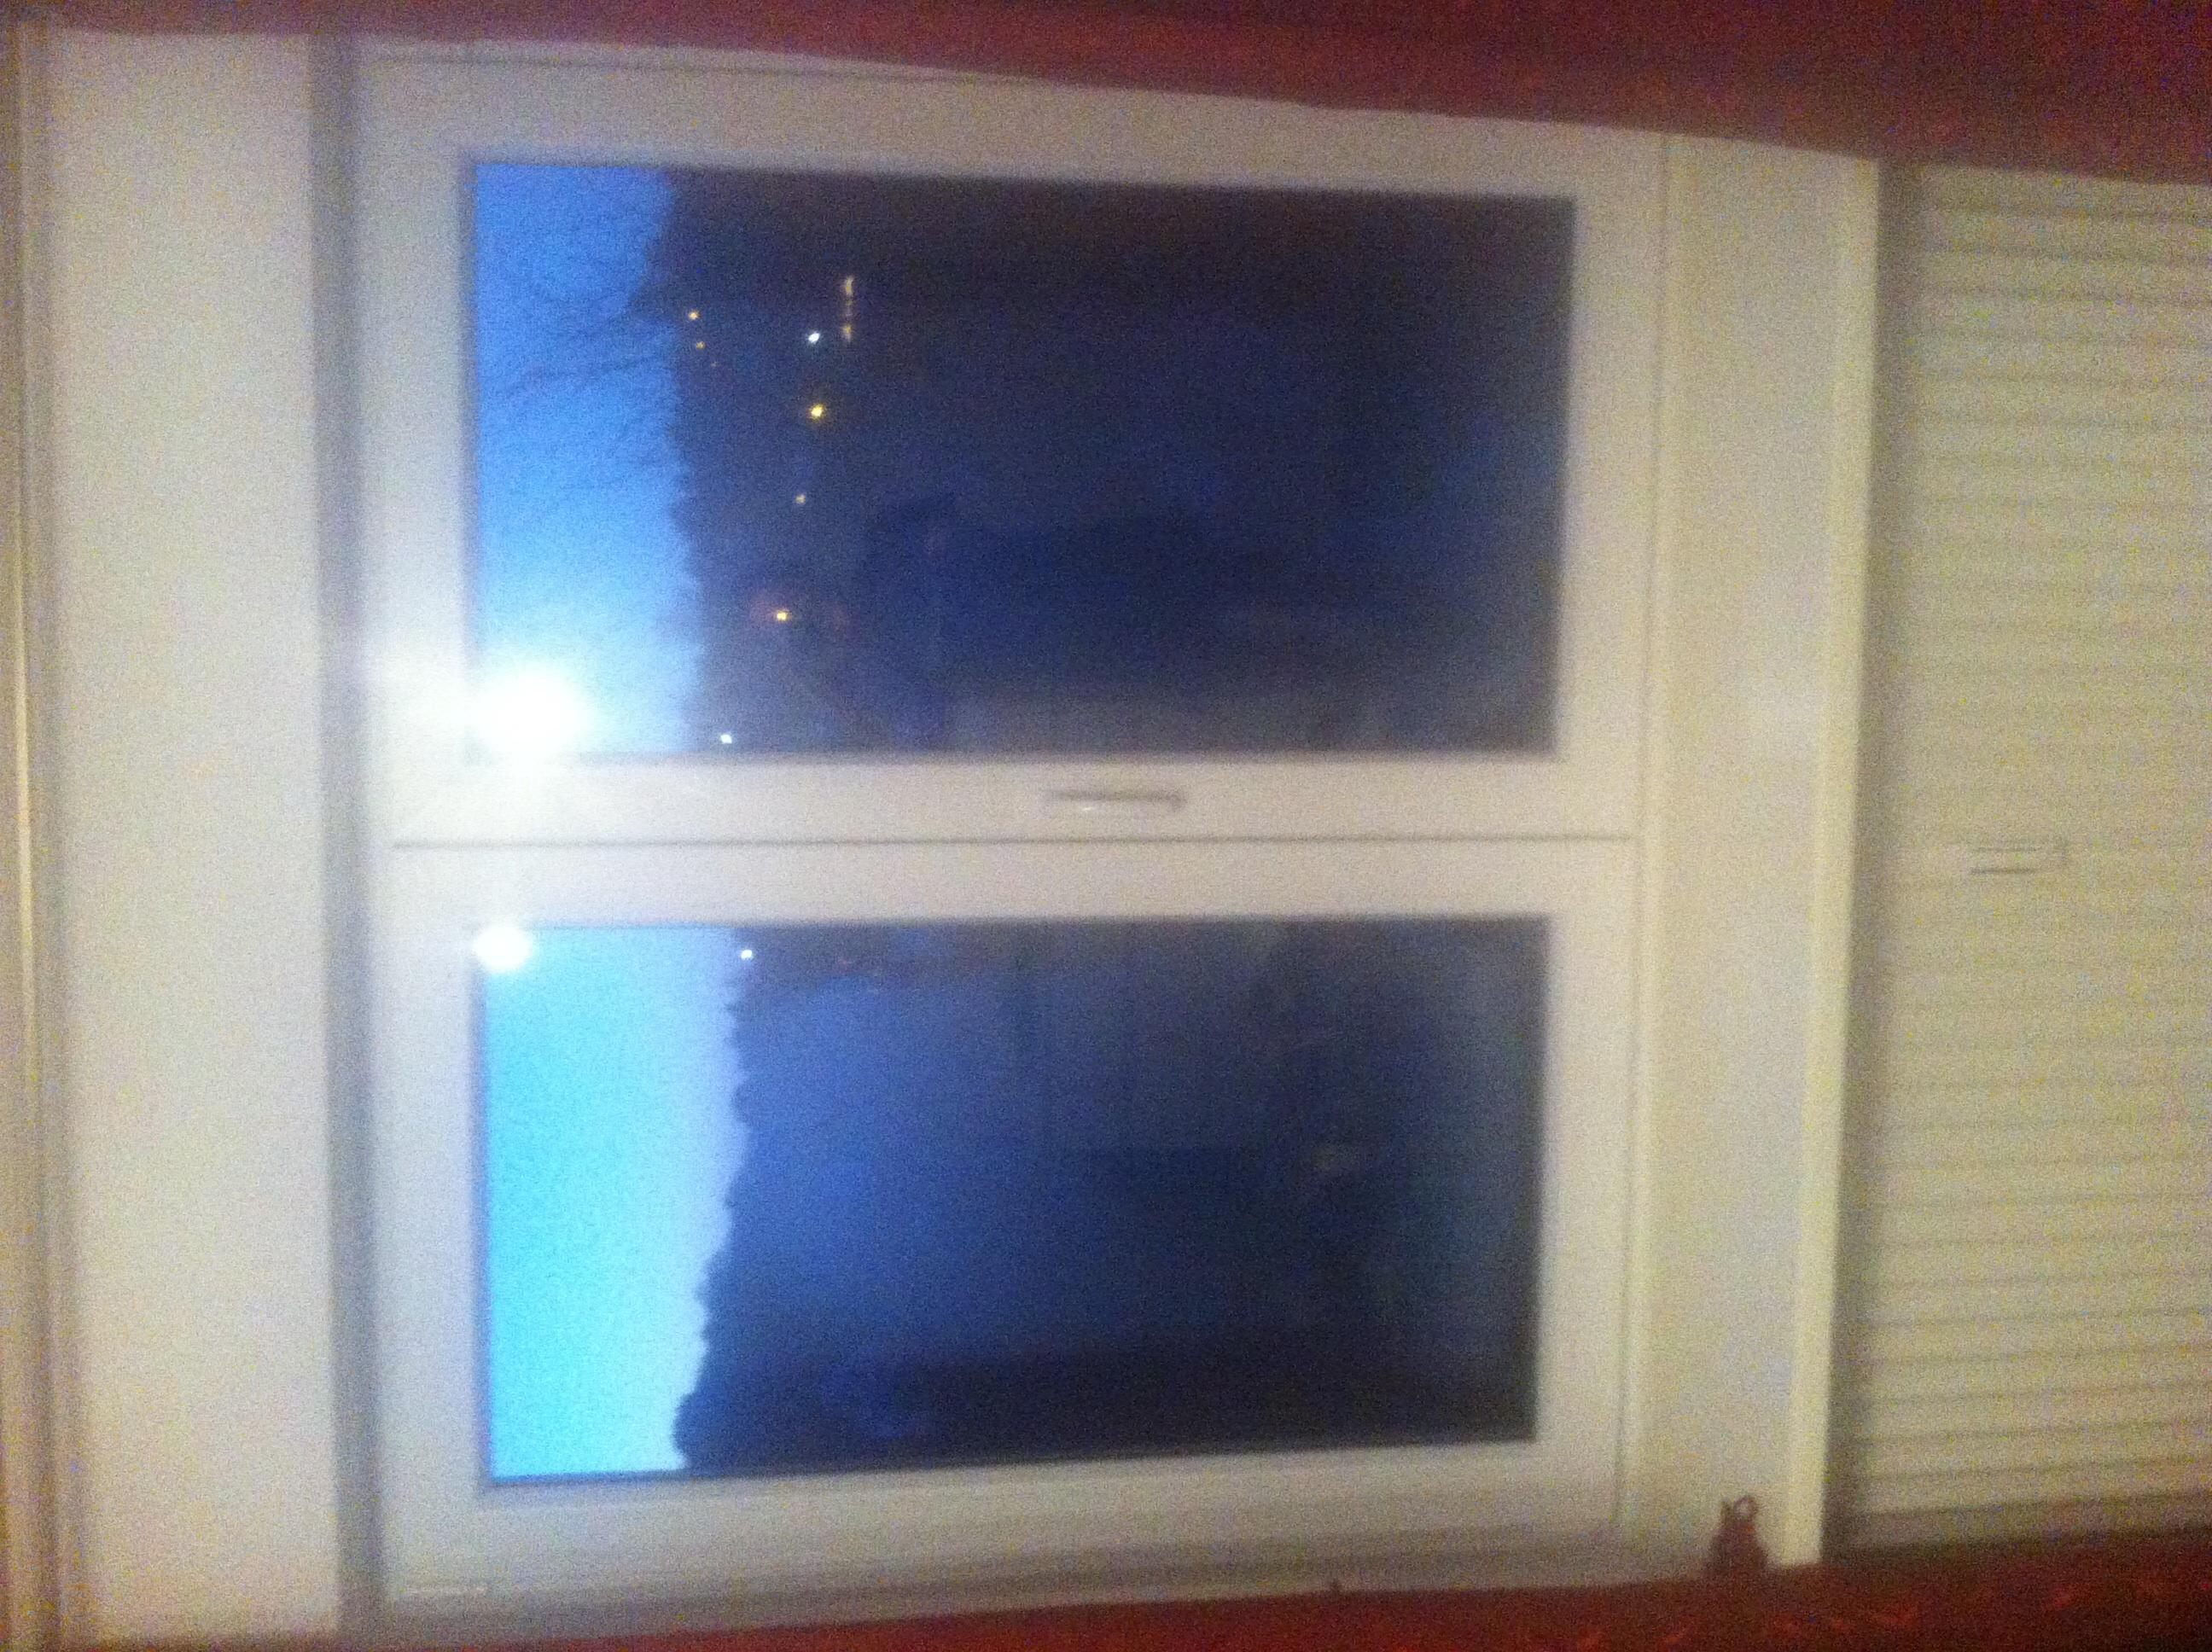 Fenster nass schimmelbildung haustechnikdialog for Fenster nass